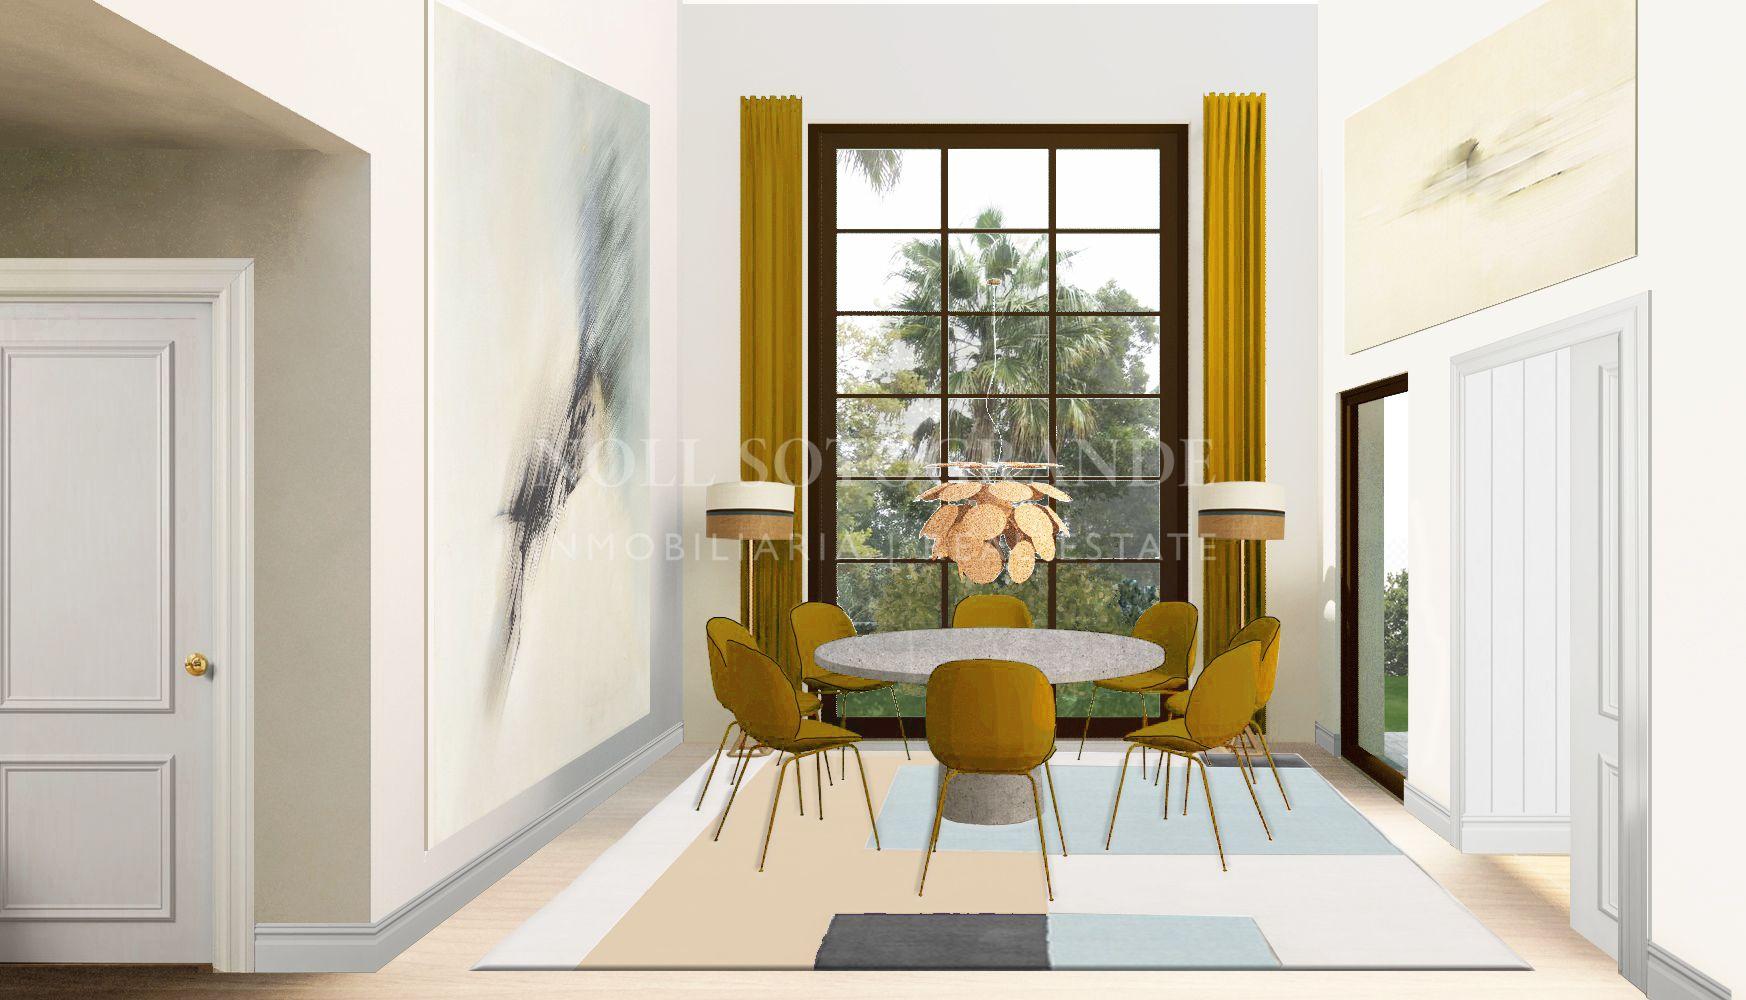 Magnificent contemporary style off-plan villa for sale in Sotogrande.